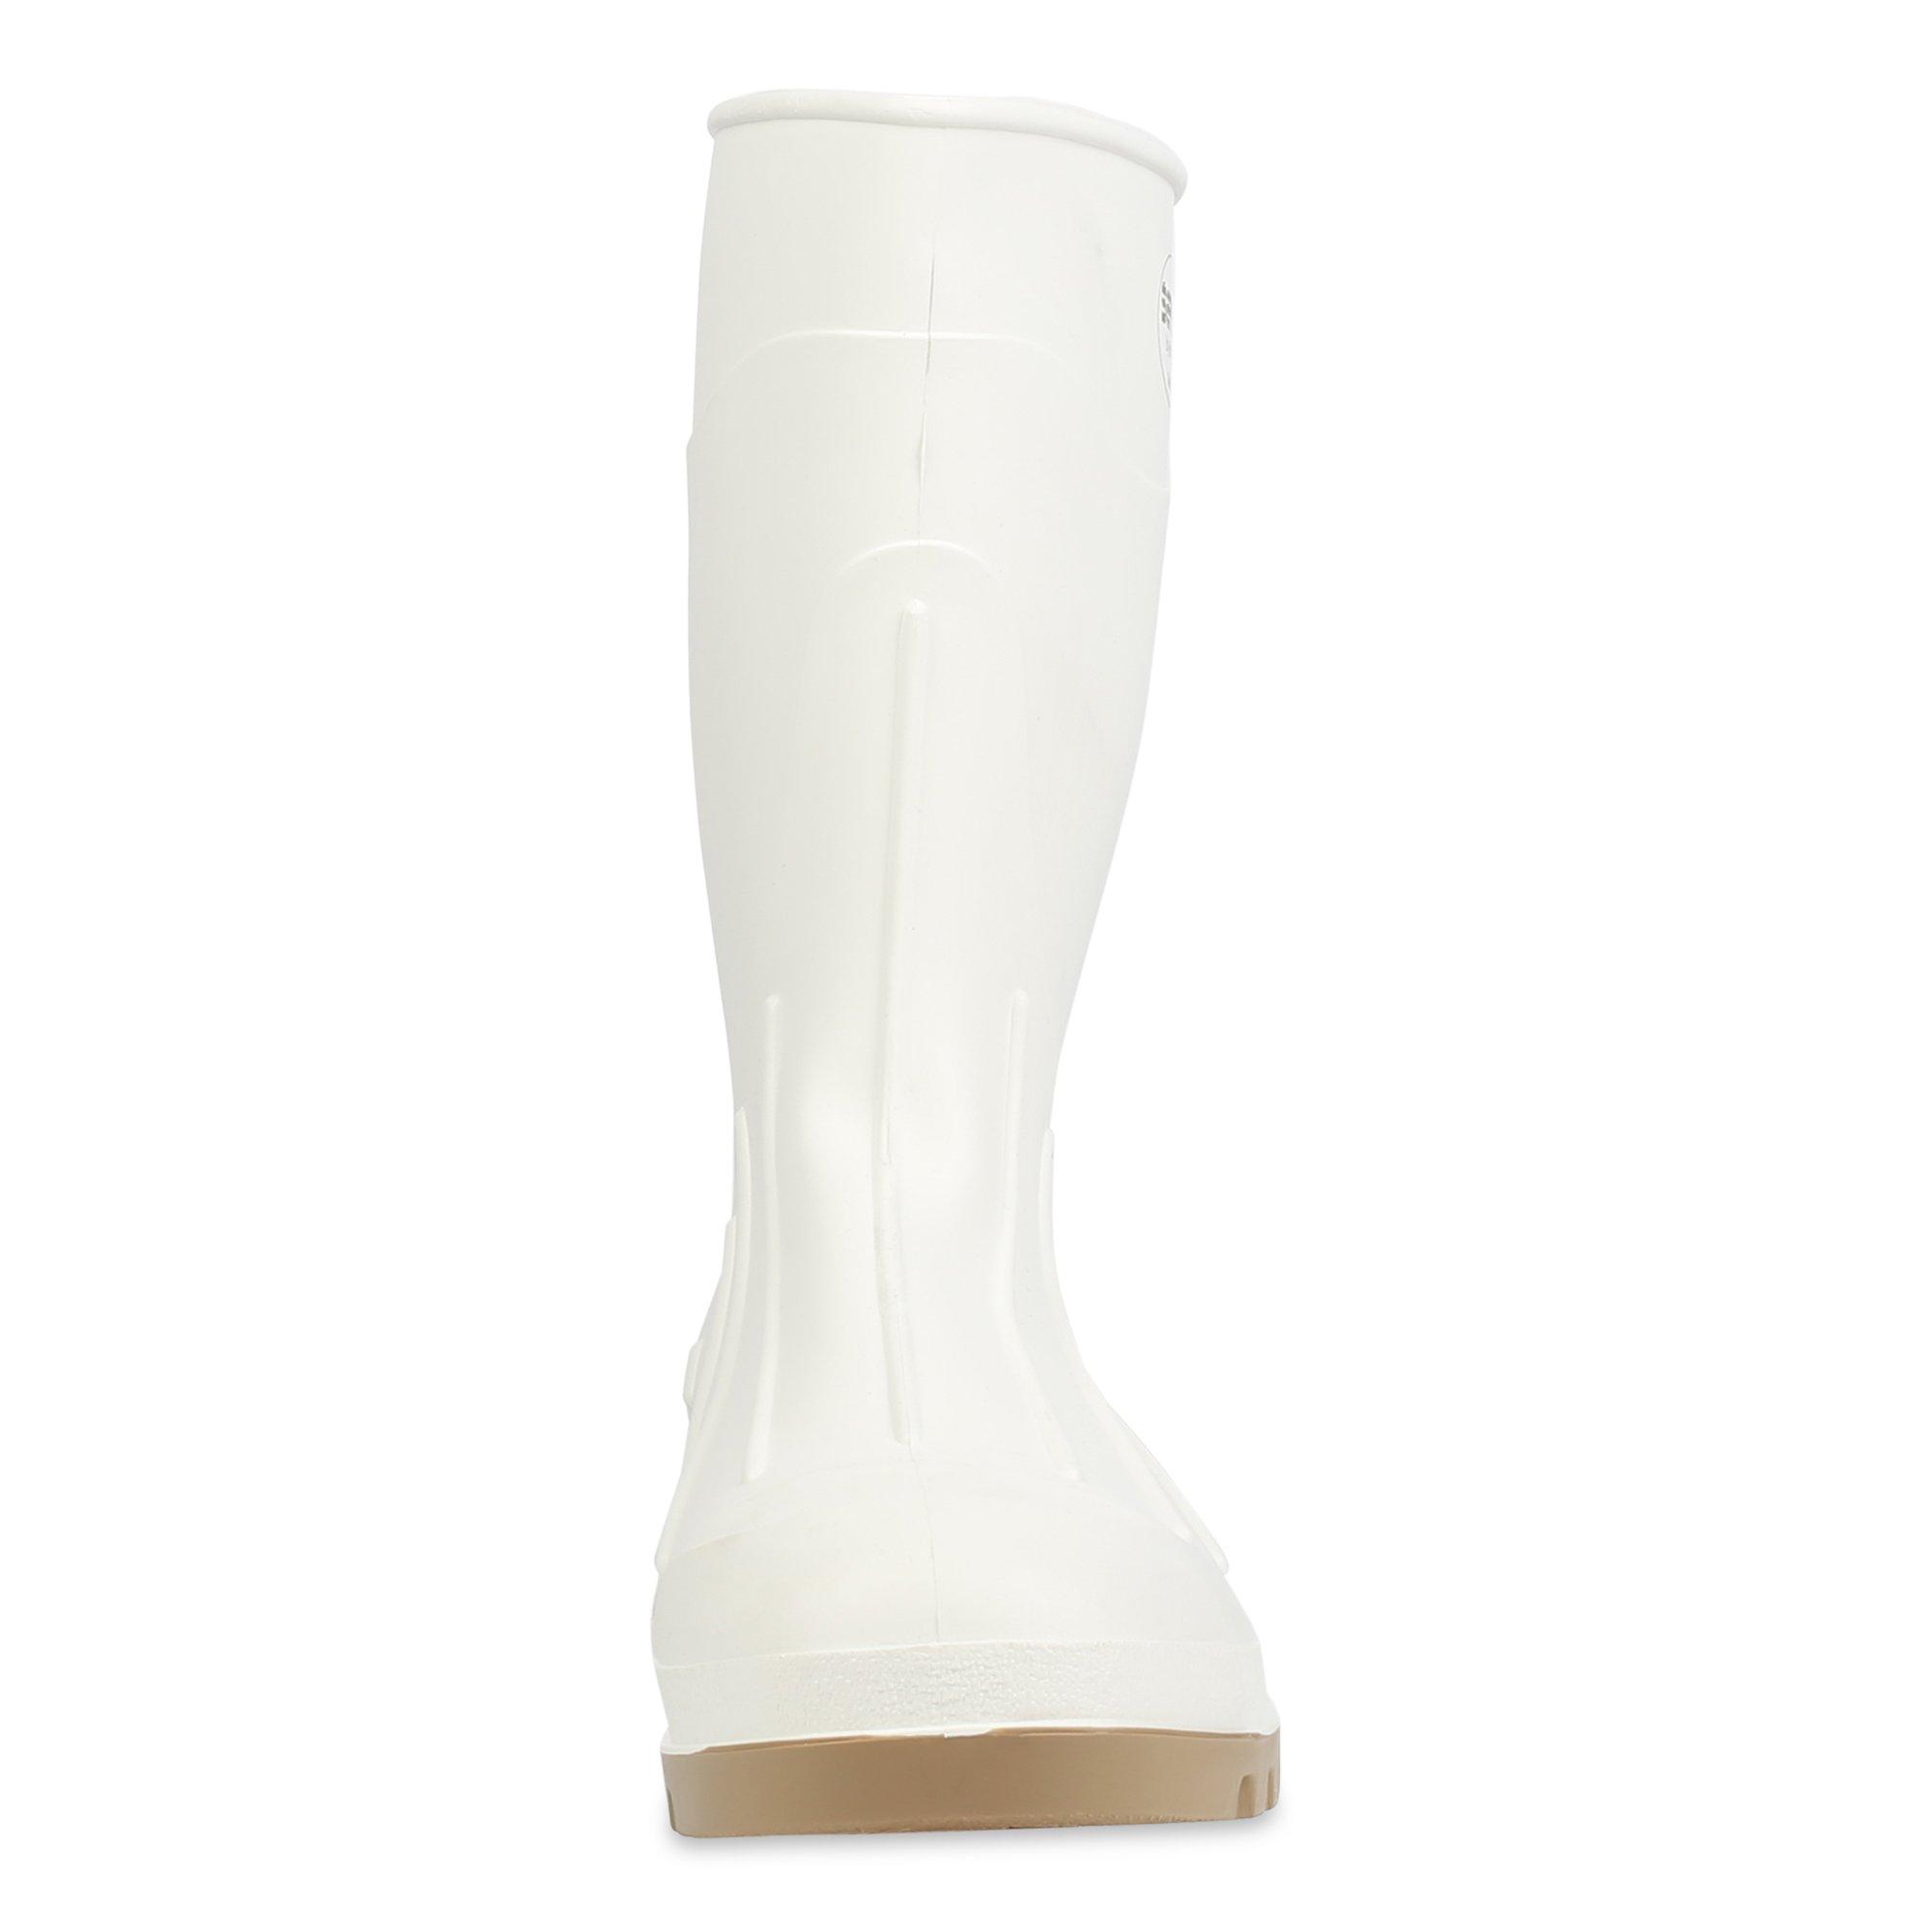 Servus 12'' PVC Polyblend Soft Toe Shrimp Boots, White (74928) by Honeywell (Image #2)